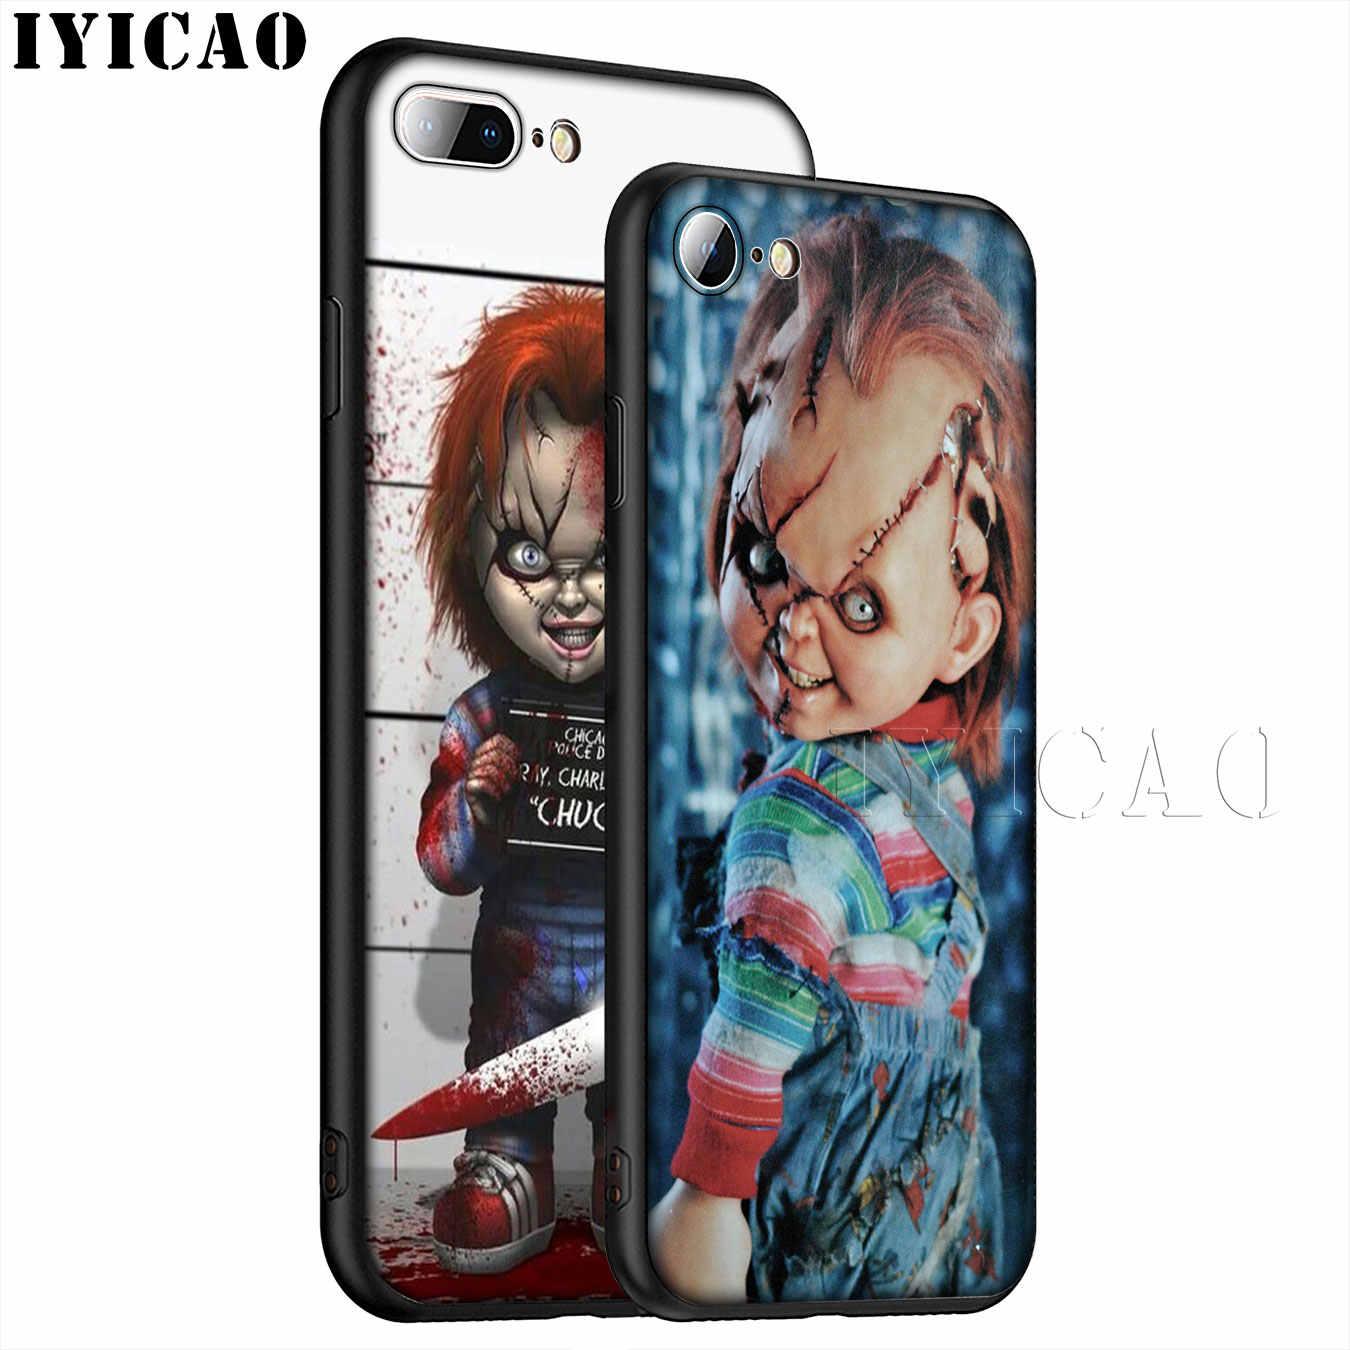 IYICAO Charles Lee Ray кукла Чаки хит продаж Мягкий силиконовый чехол для телефона iPhone XR X XS 11 Pro Max 6 6S 7 8 Plus 5 5S SE 10